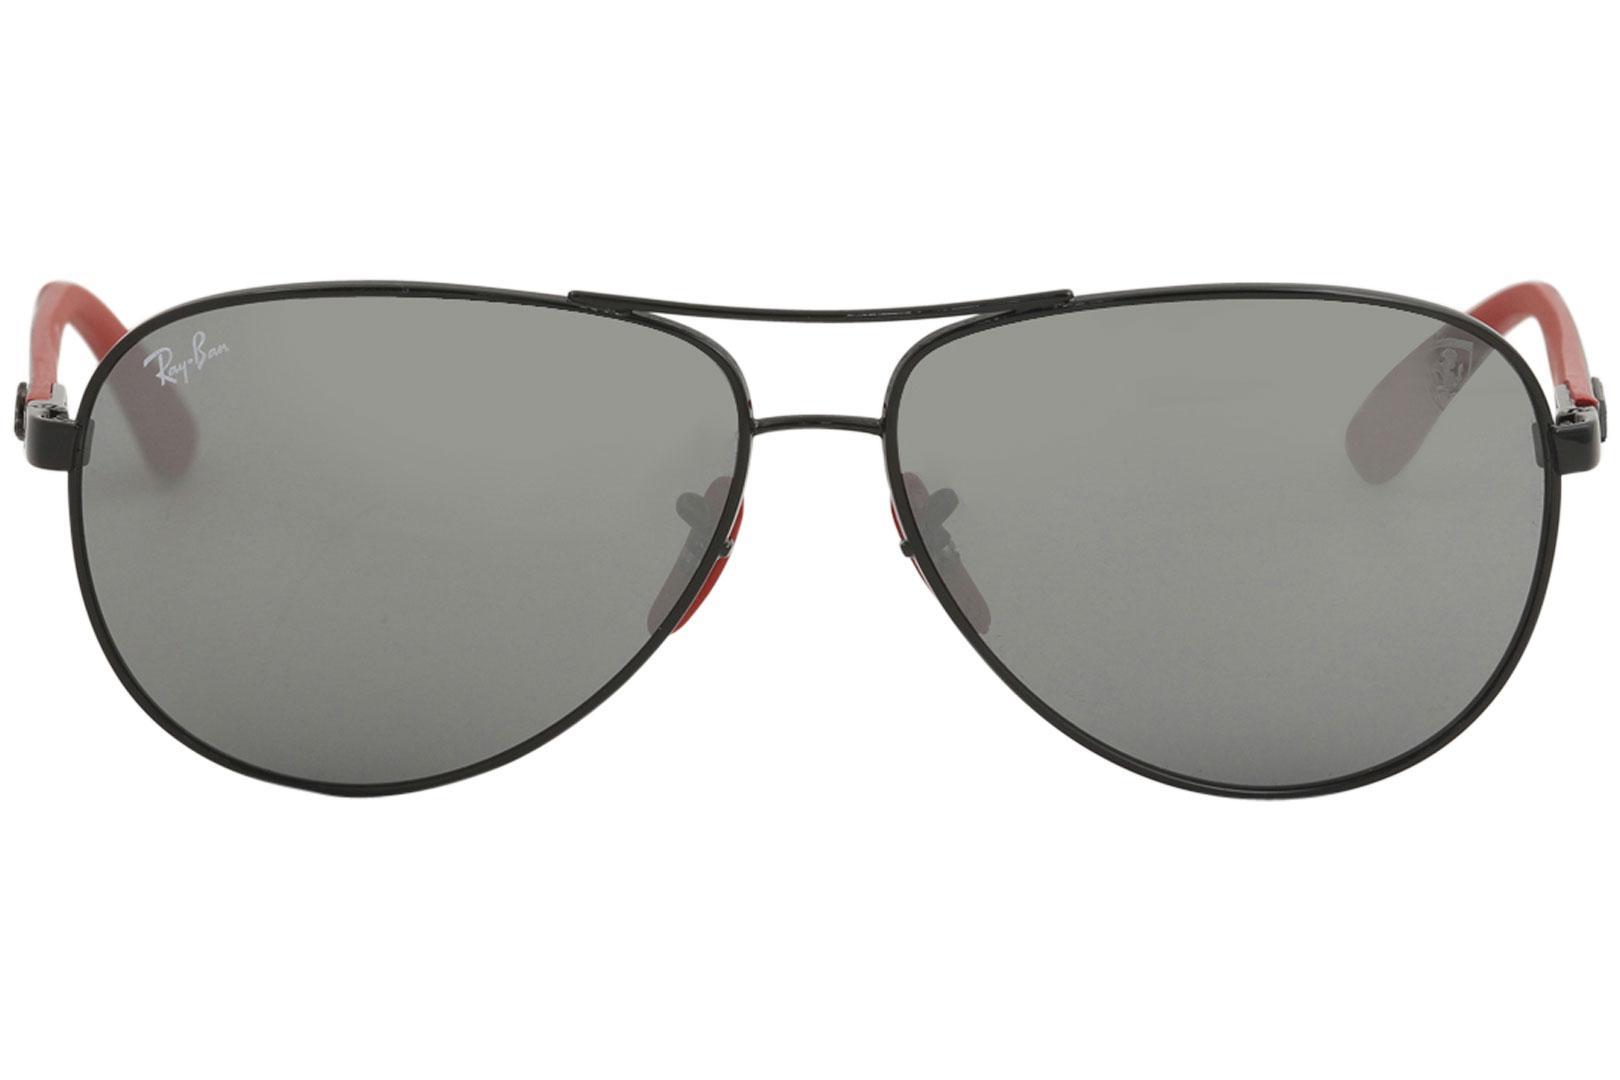 f52be9b173a Ray Ban Men s Scuderia Ferrari RB8313M 8313 Fashion Aviator Ray Ban  Sunglasses by Ray Ban